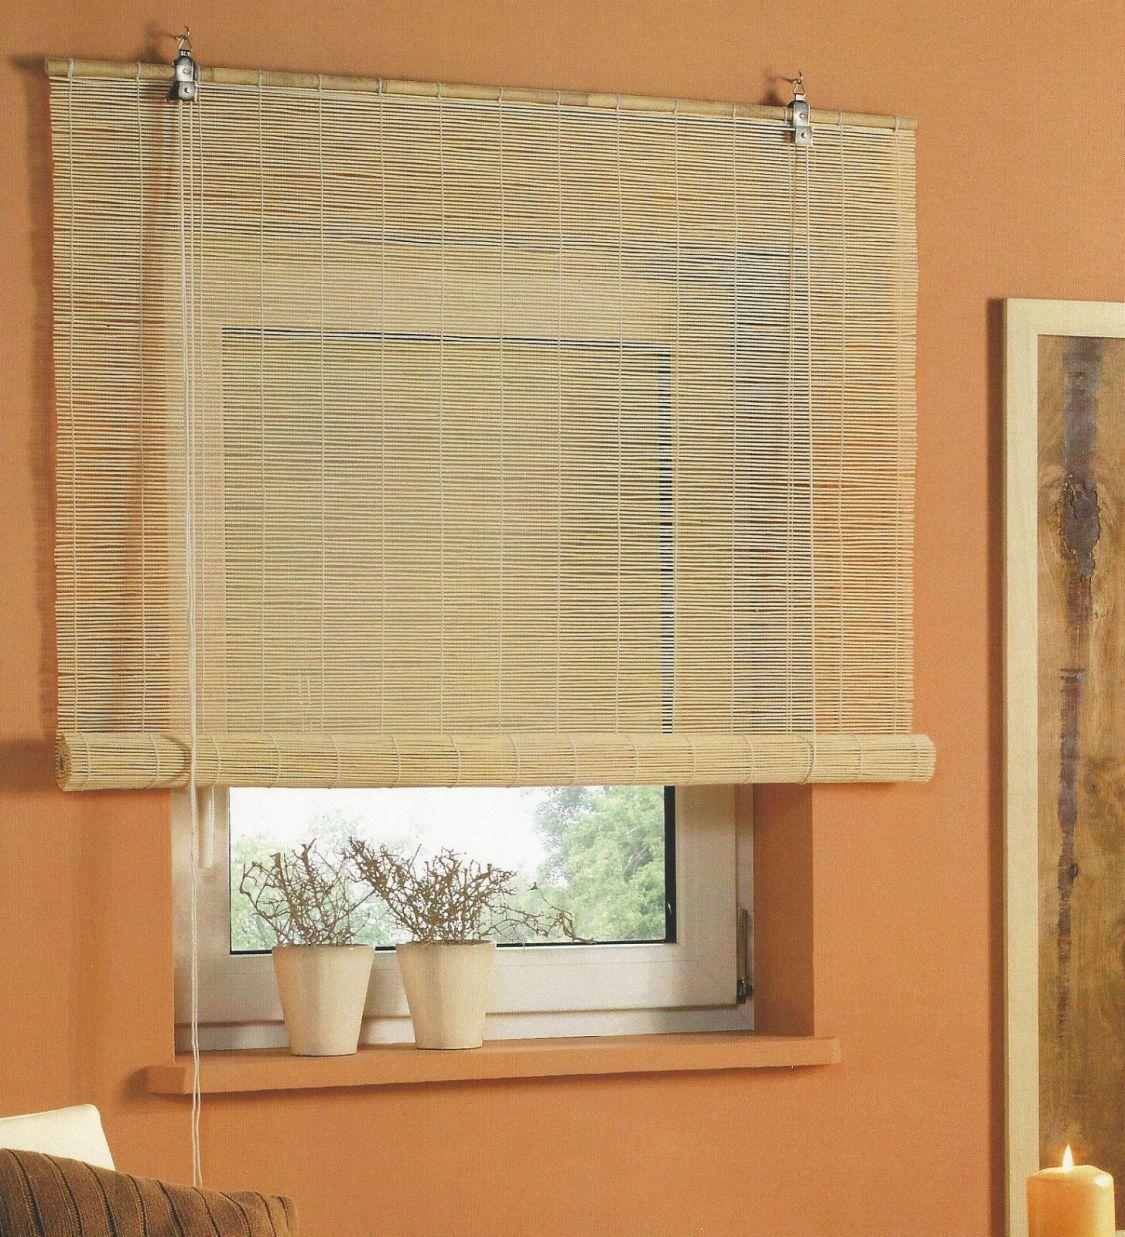 Bambus Rollo Holz Jalousie Bambusrollo Sichtschutz Holzrollo Fensterrollo Natur